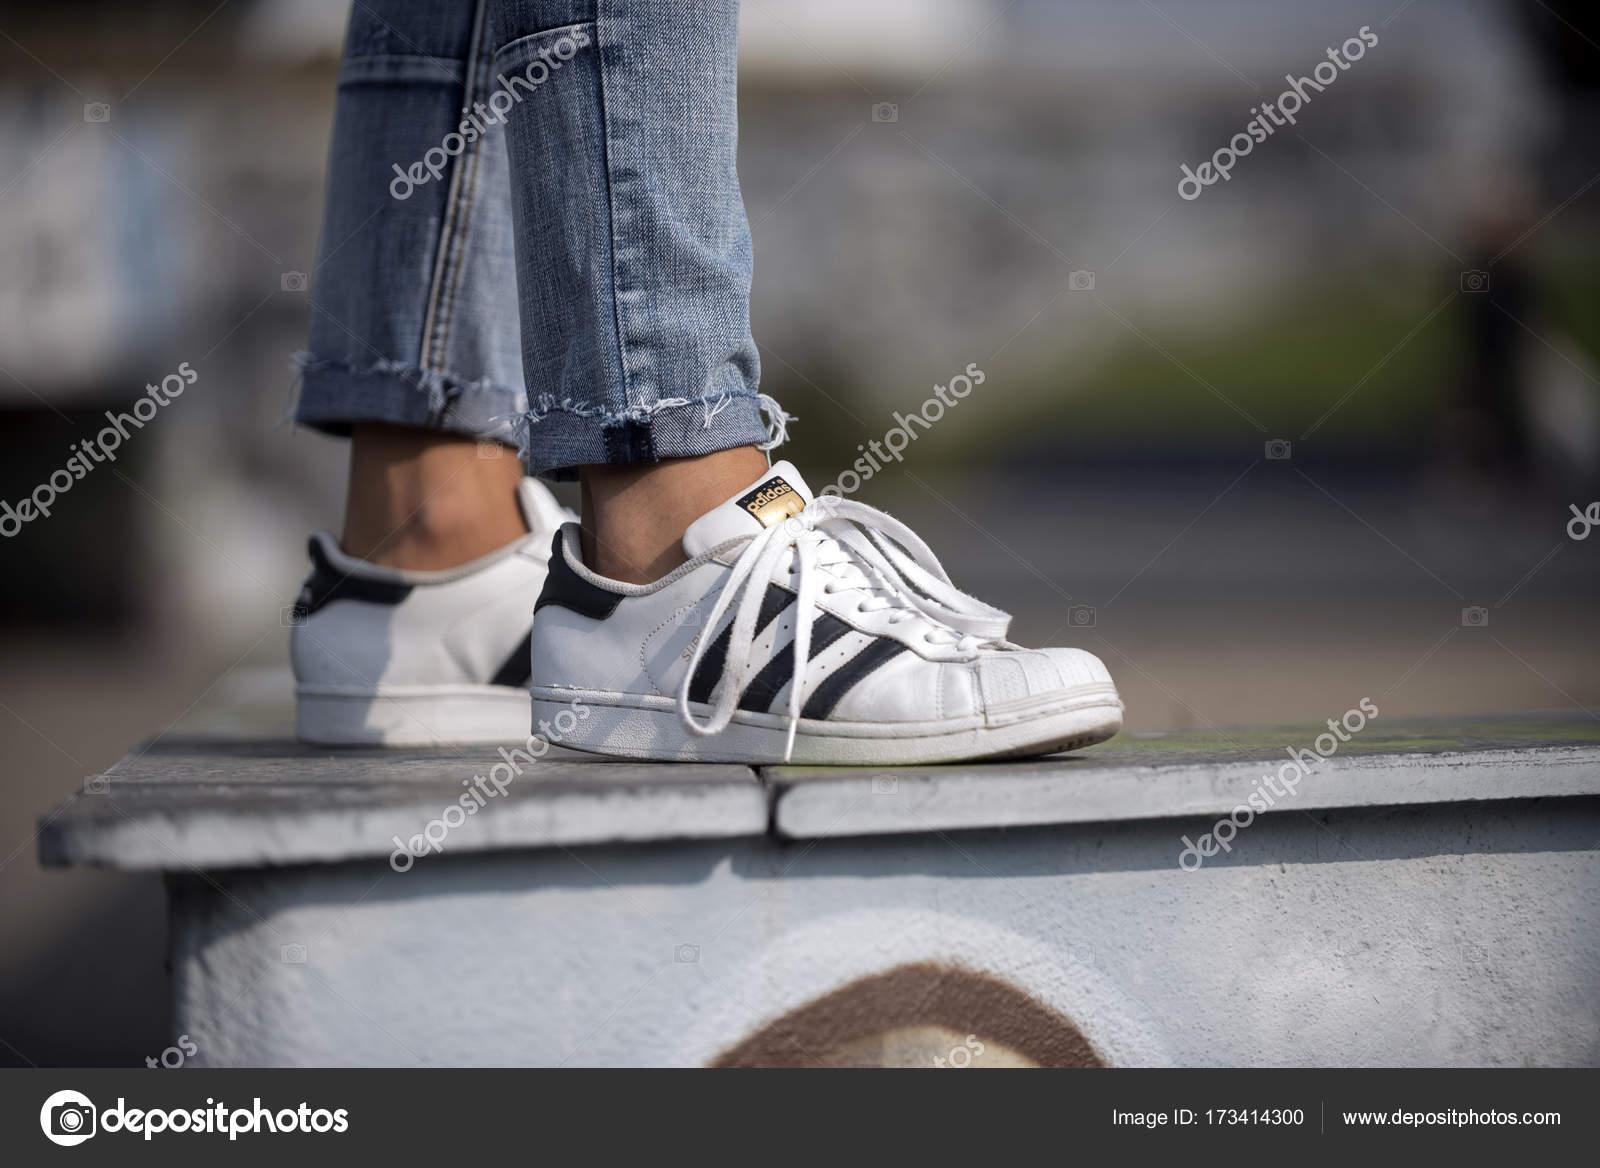 Superstar Adidas Auf Italien Schuhe September Mailand 2017 xerCBoWd